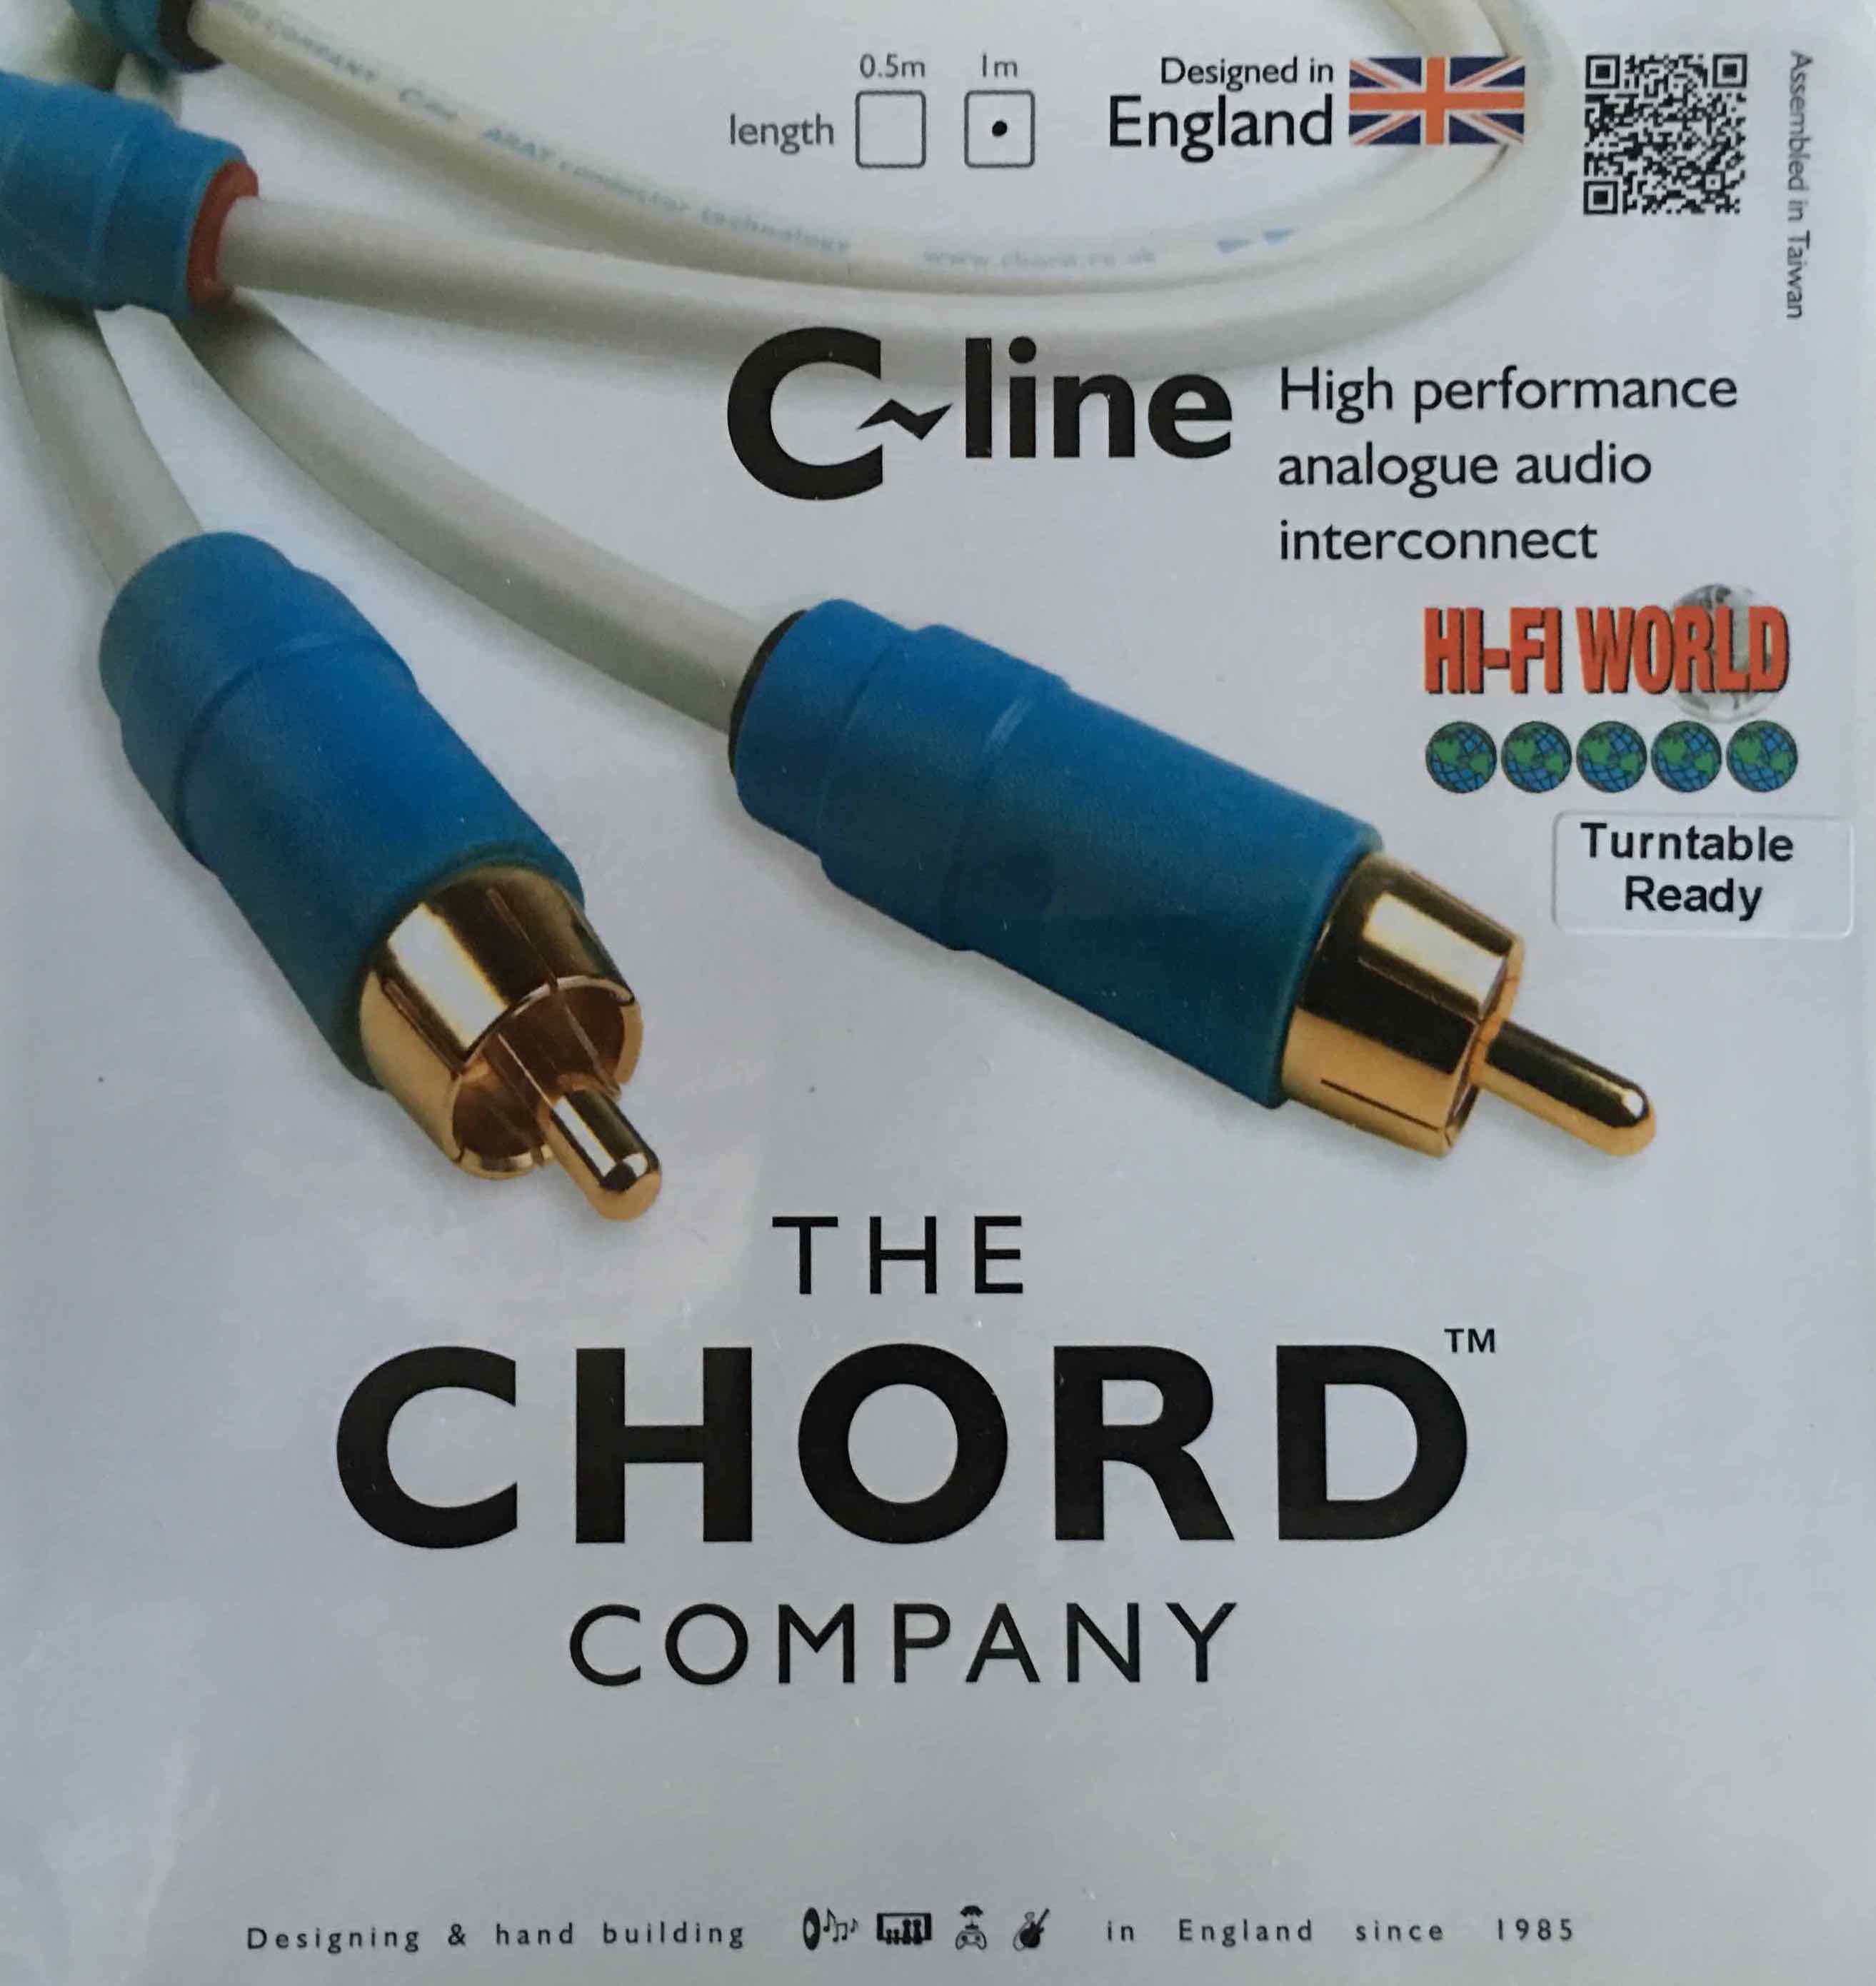 Chord C-line